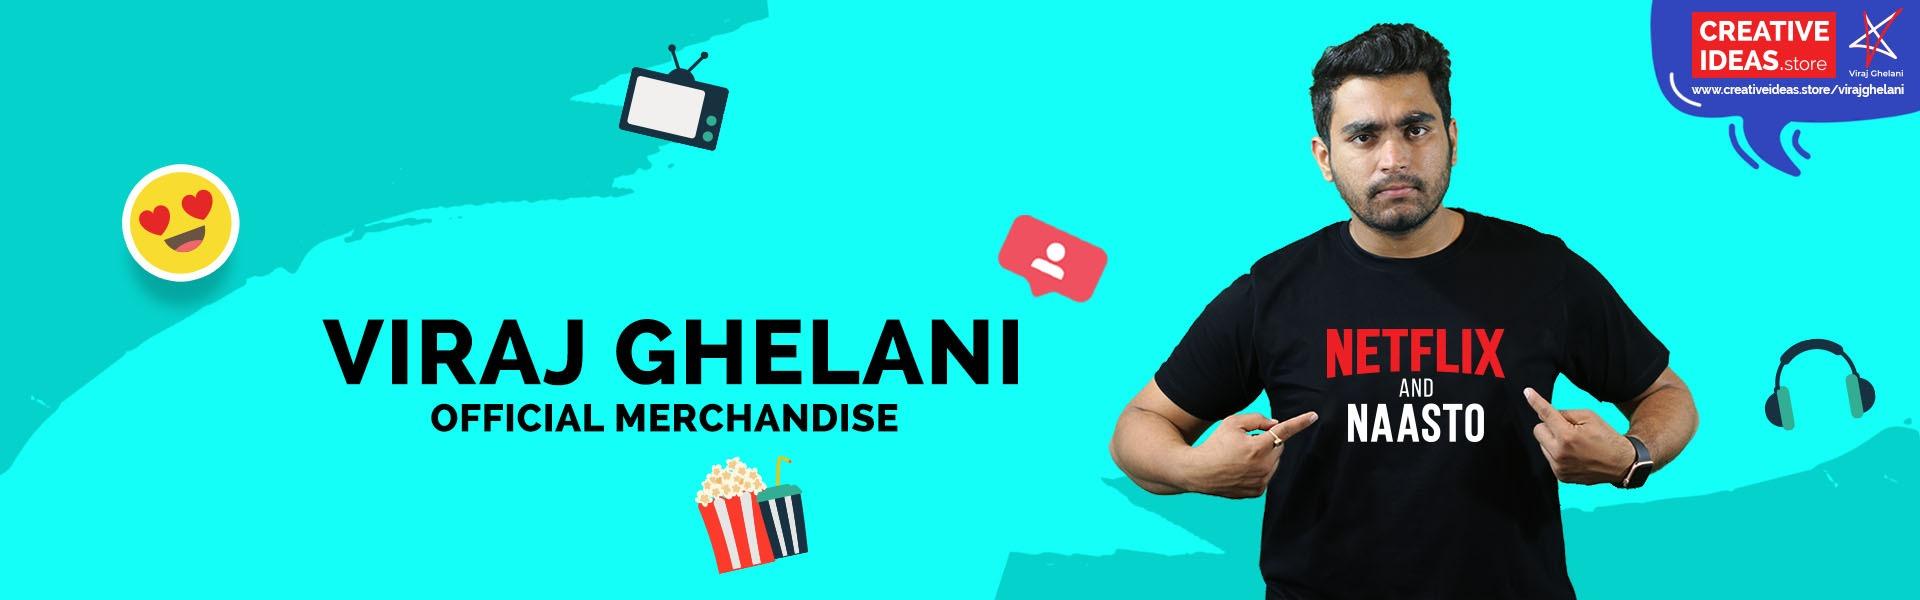 Official Viraj Ghelani Merchandise